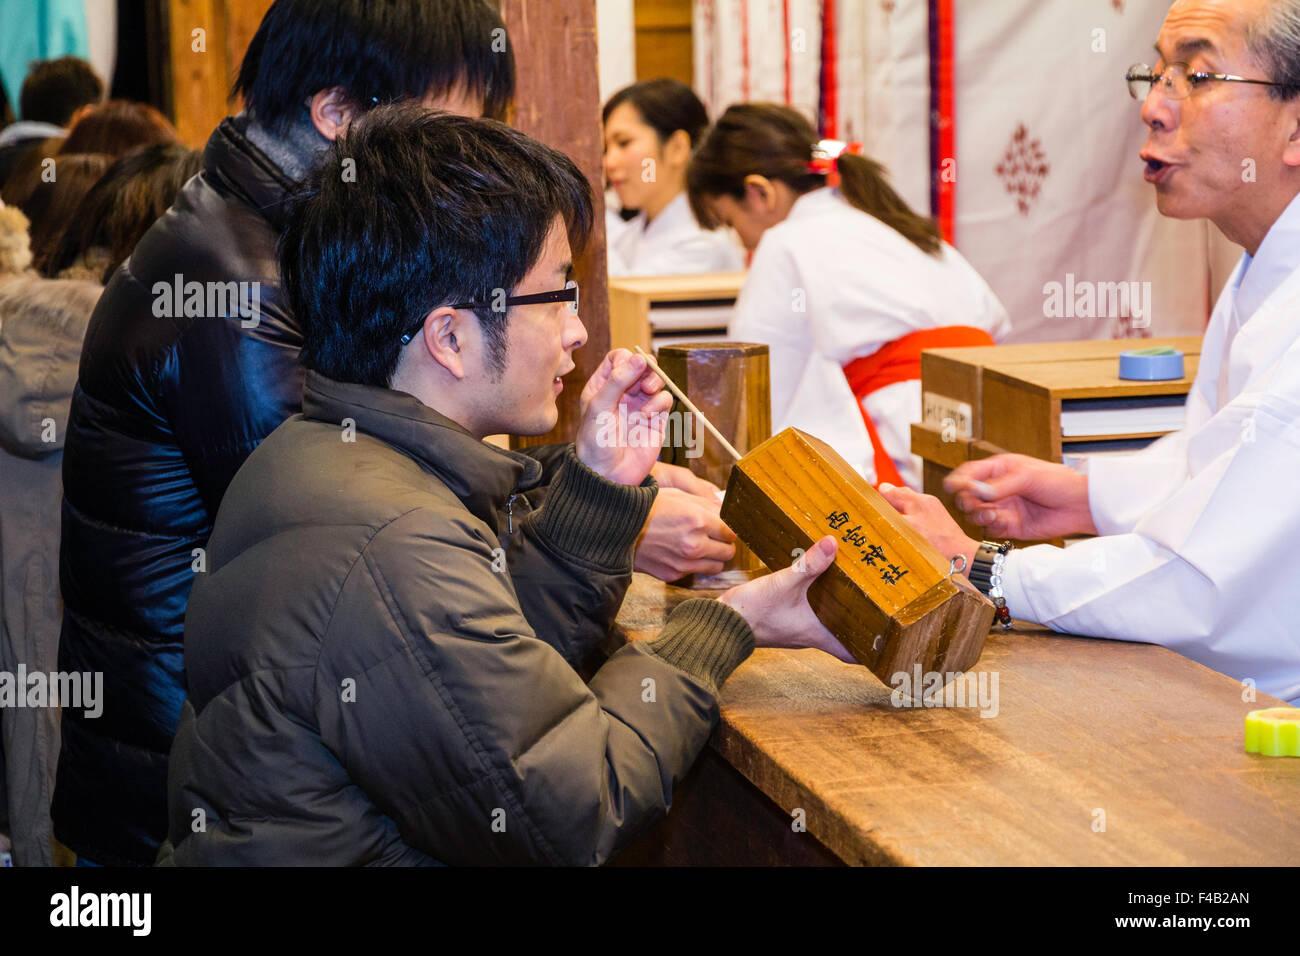 Japan, Nishinomiya shrine, New year Day, Shogatsu. Couple buying omikuji fortune papers from busy shrine office, - Stock Image